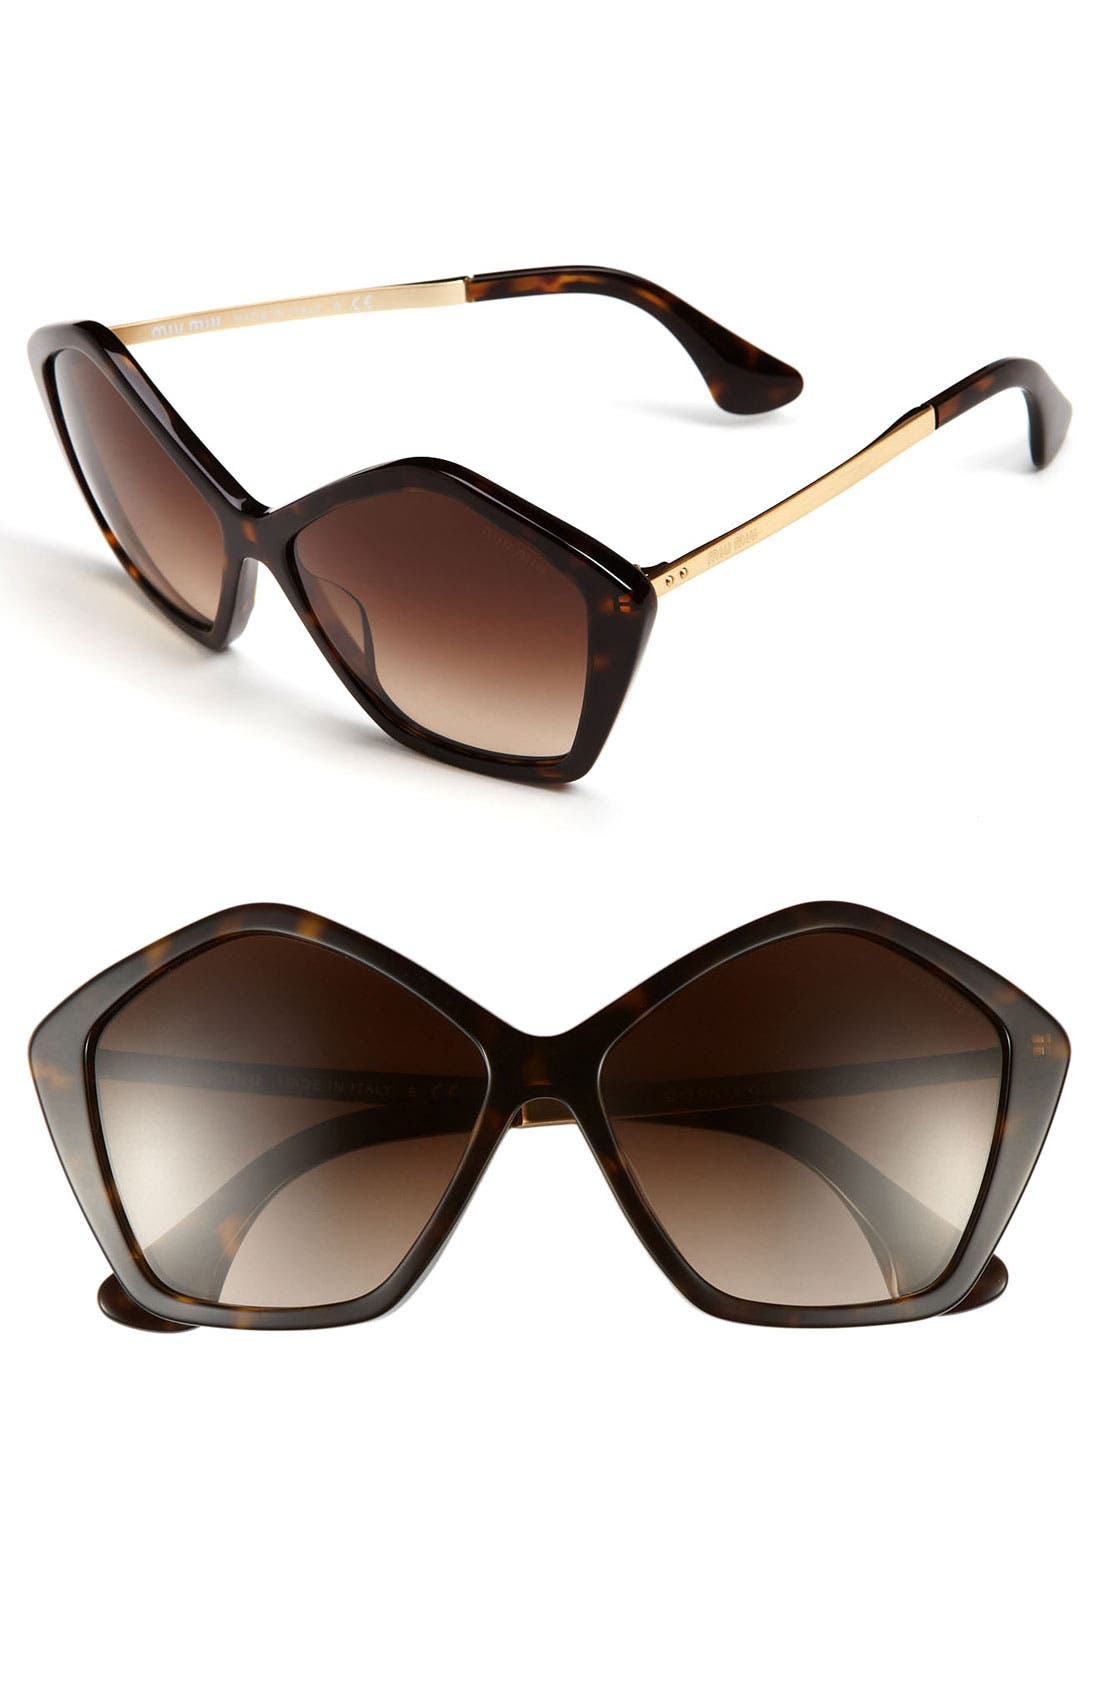 Alternate Image 1 Selected - Miu Miu 'Culte Collection' 57mm Geometric Sunglasses